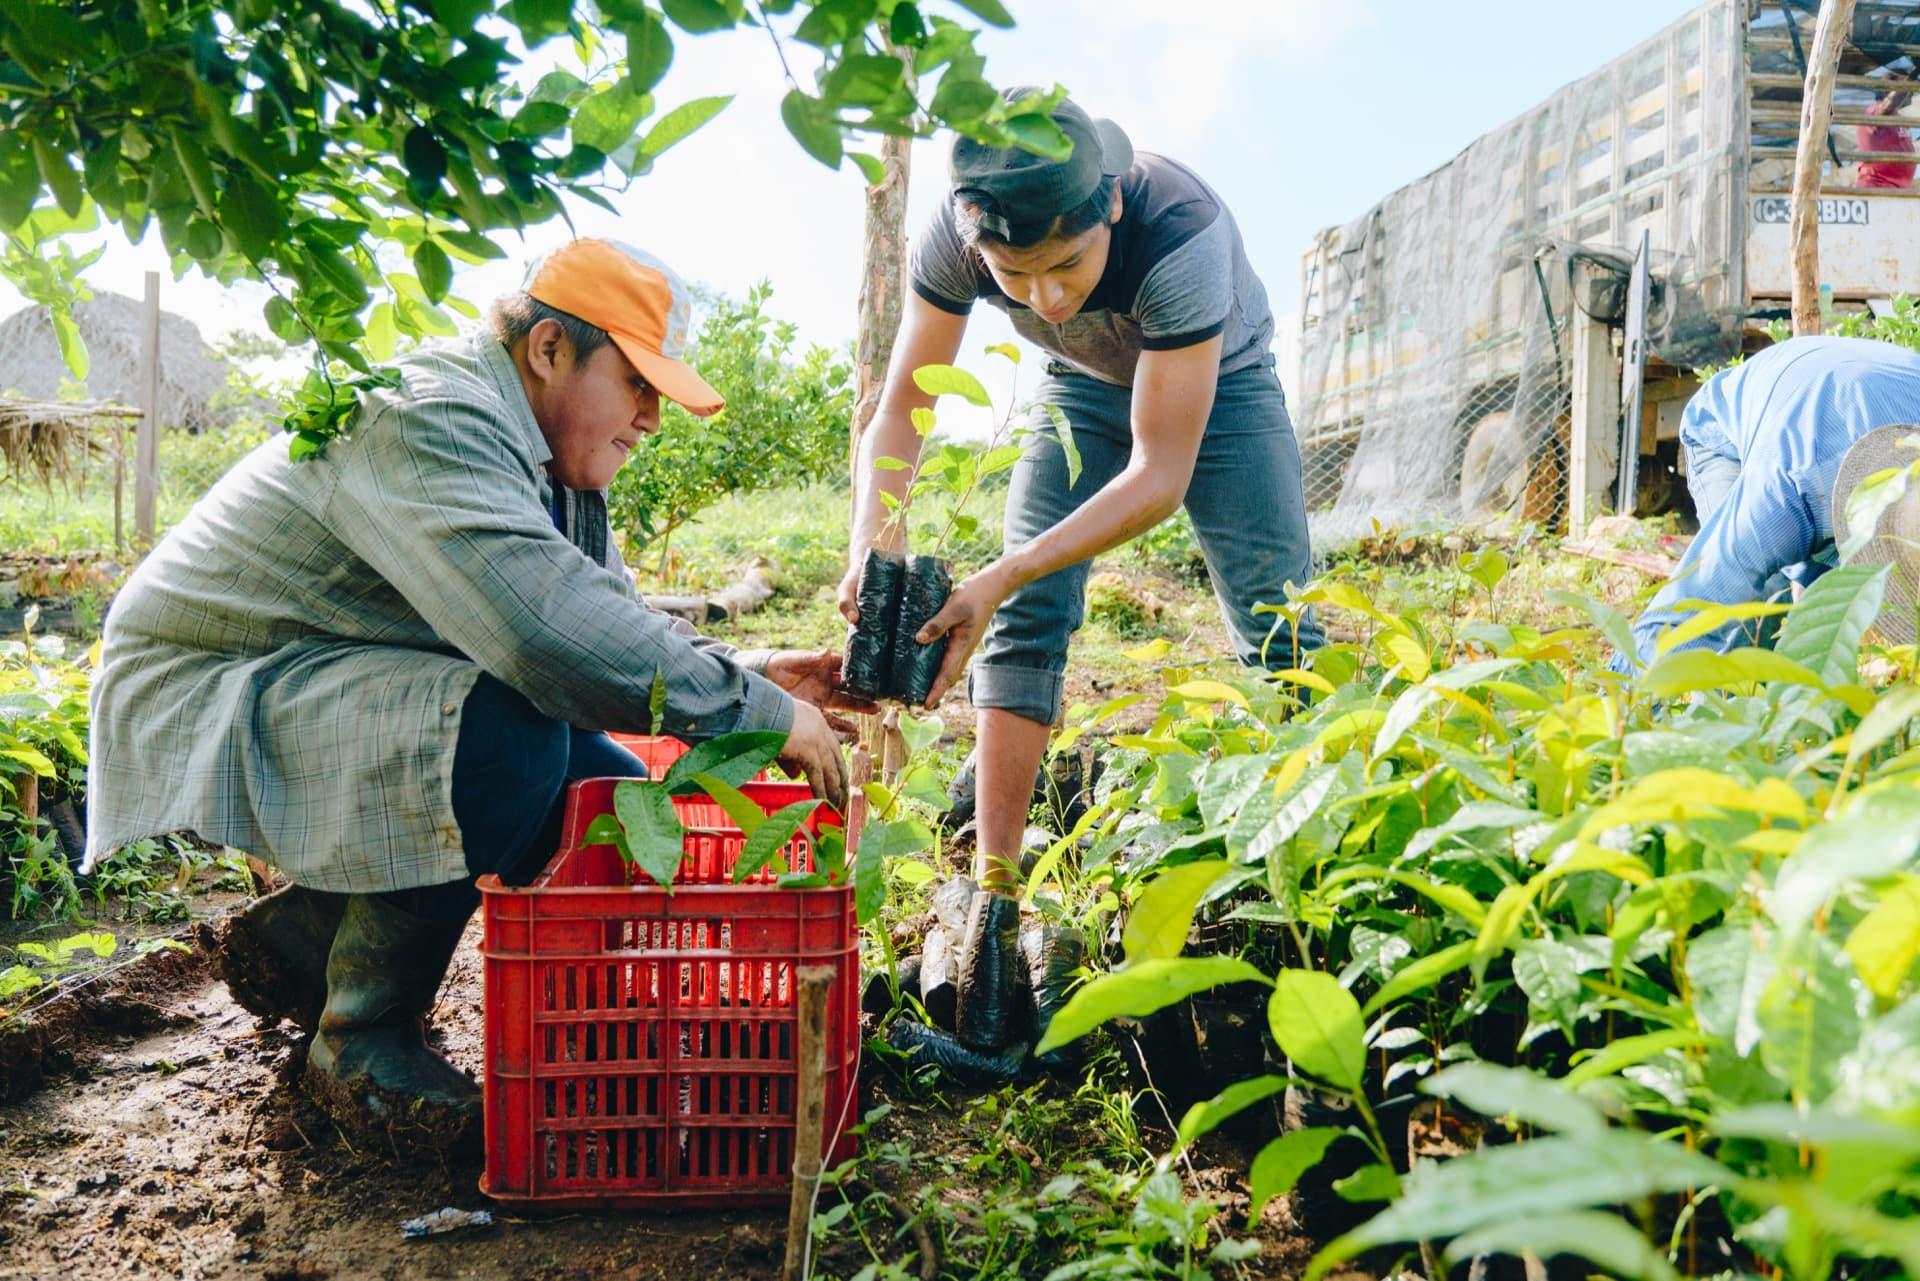 Sustainability at 360 degrees: environmental and social